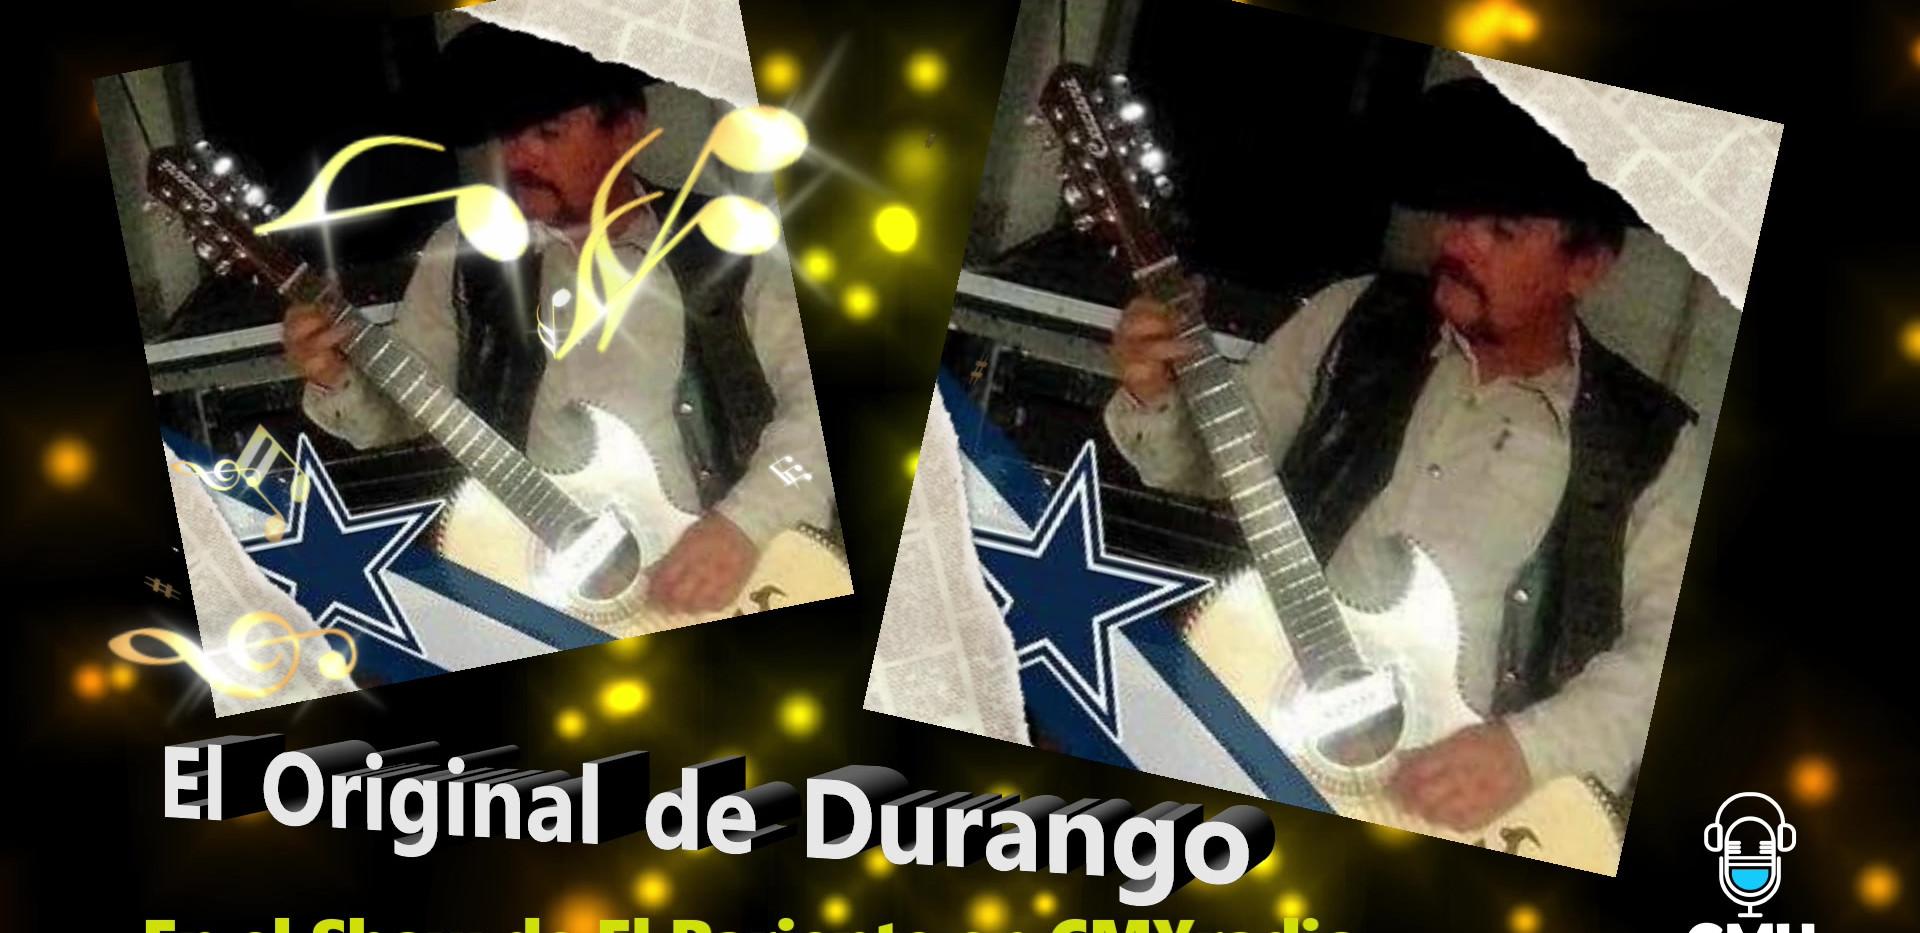 El Original de Durango